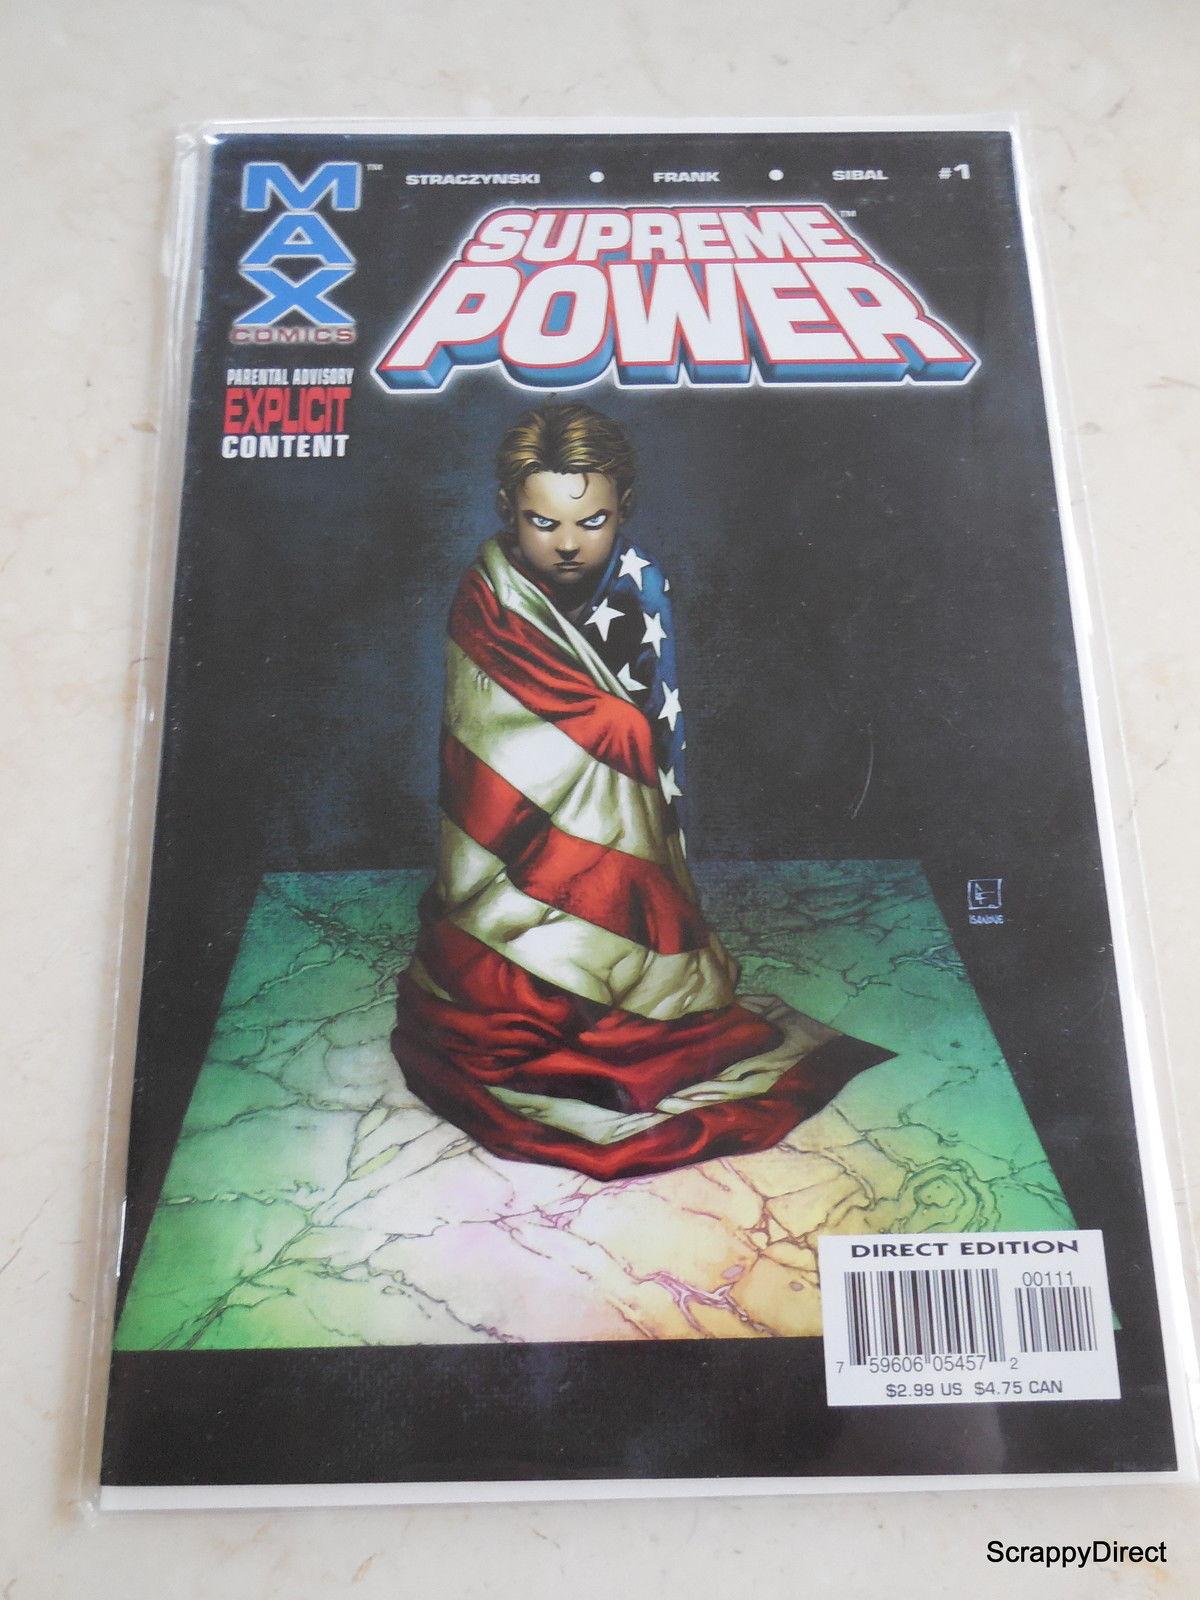 Marvel Max SUPREME POWER Vol #1 NO. #1 OCT 2003